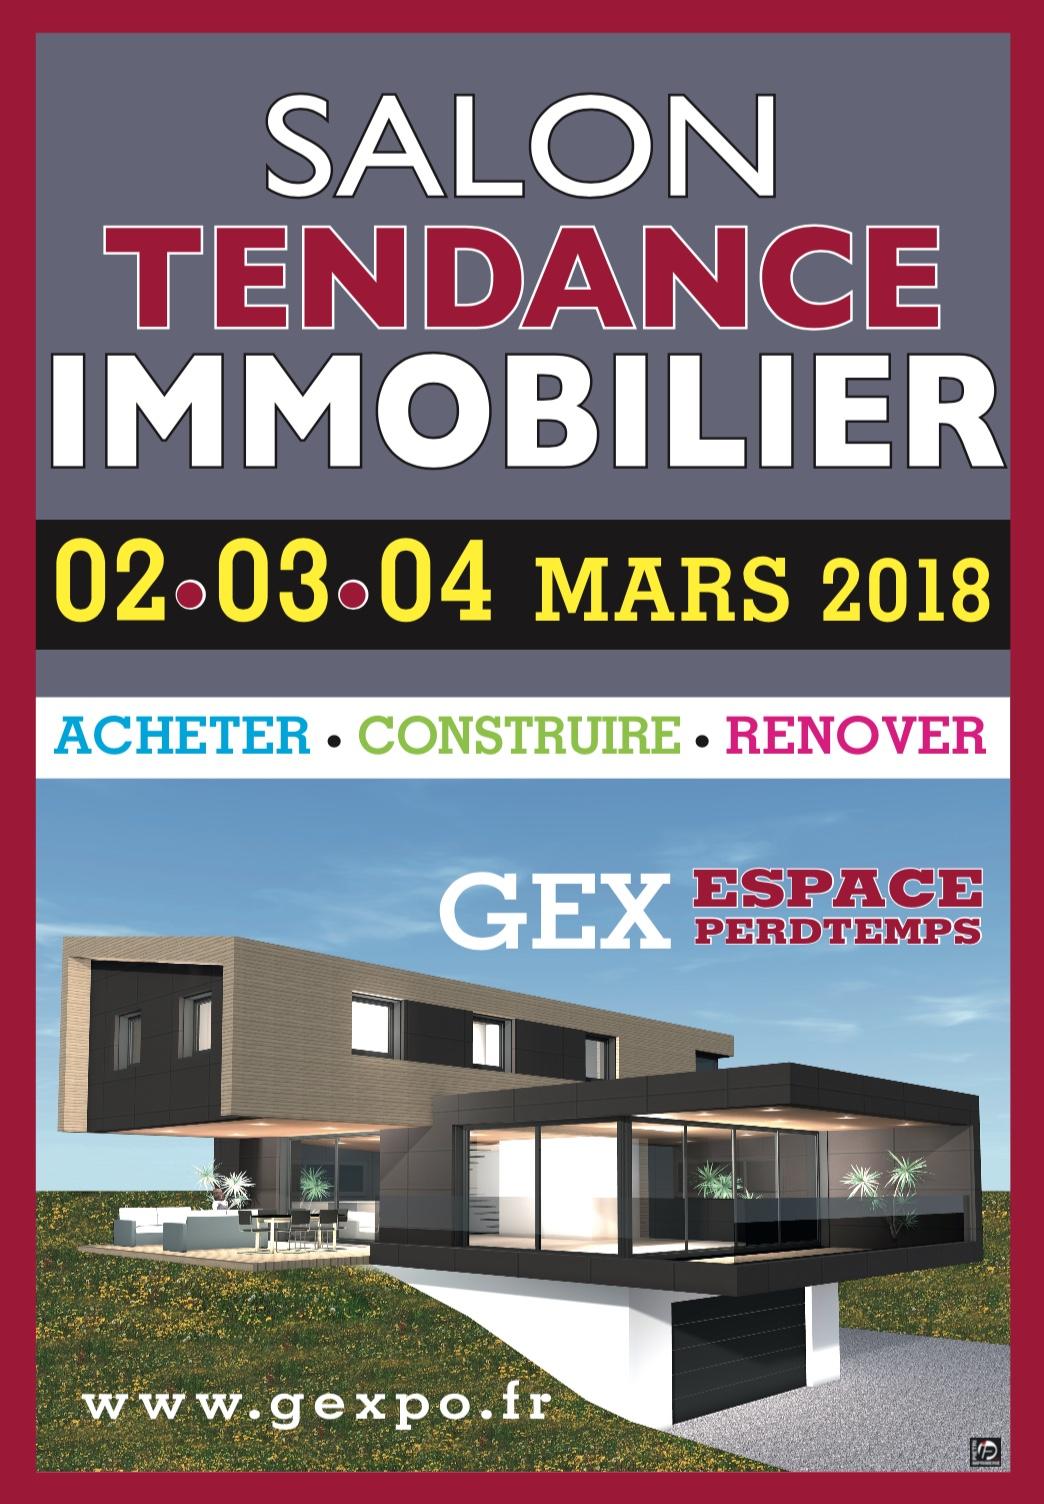 Salon tendance immobilier gex 2018 2 au 4 mars sarl for Salon immobilier